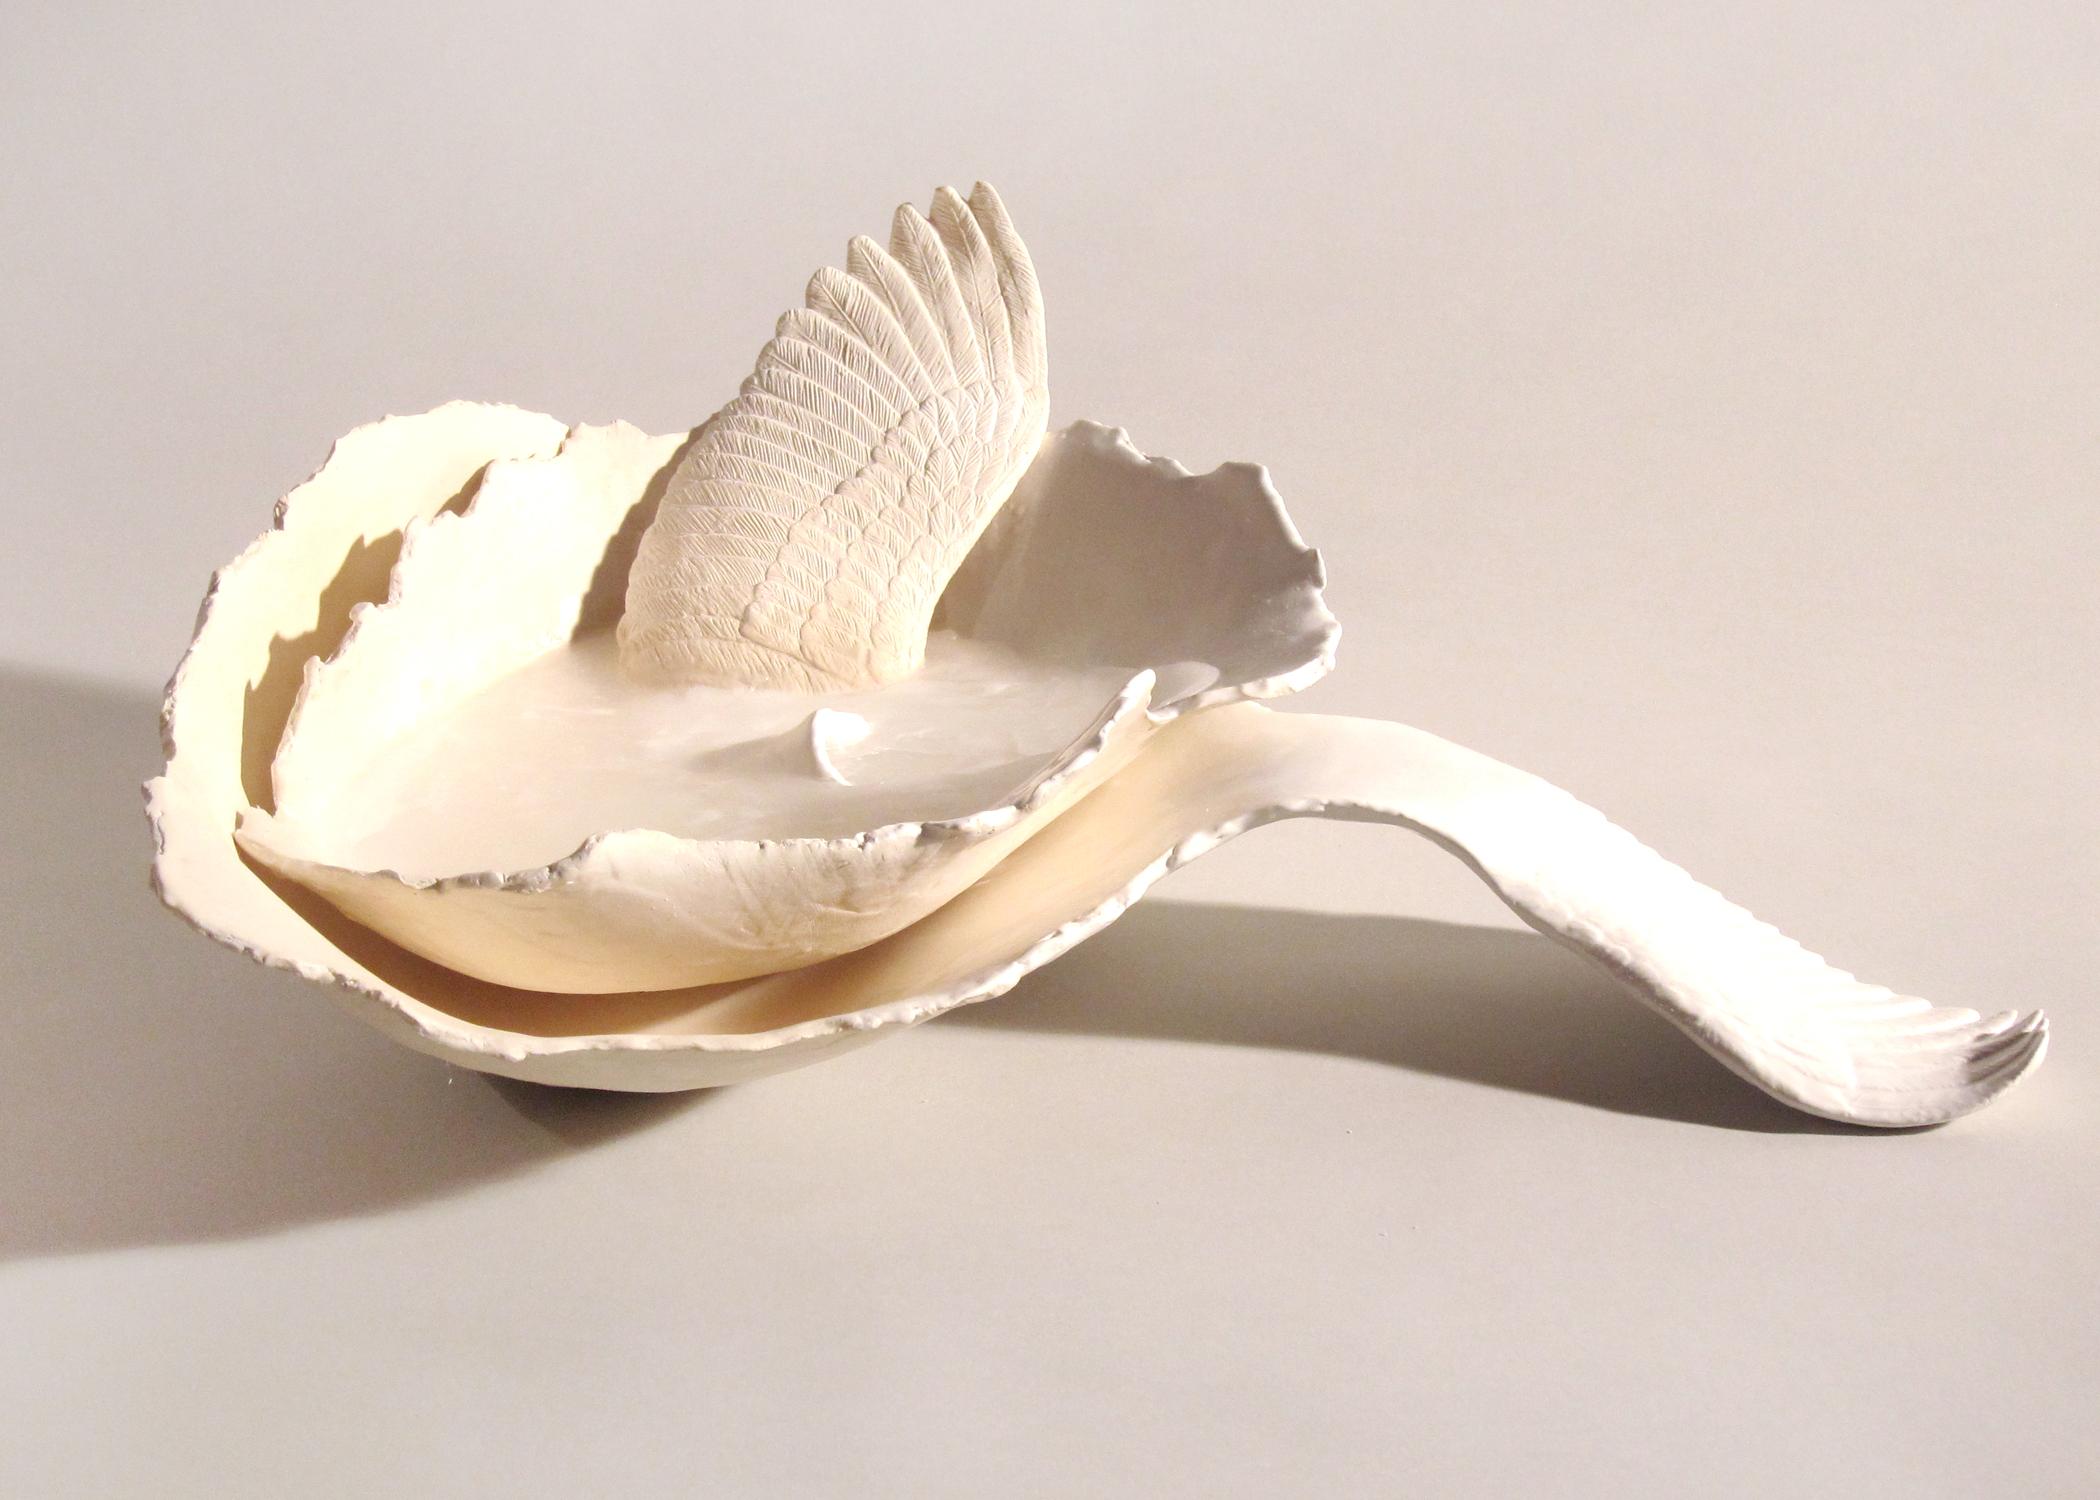 Winged Bowls